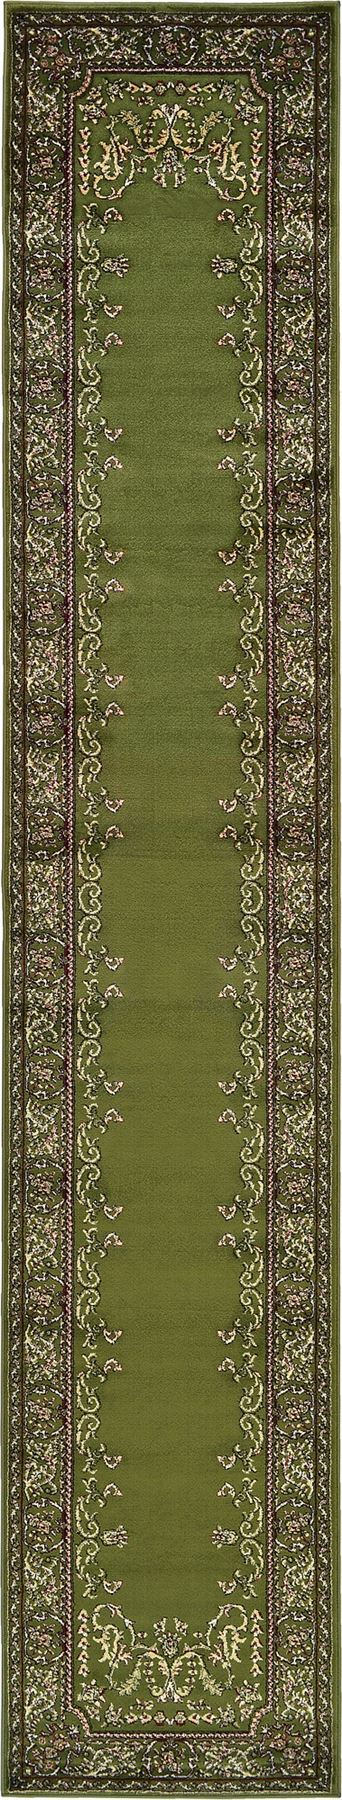 Traditional Persian Rugs Oriental Carpets Unique Designs